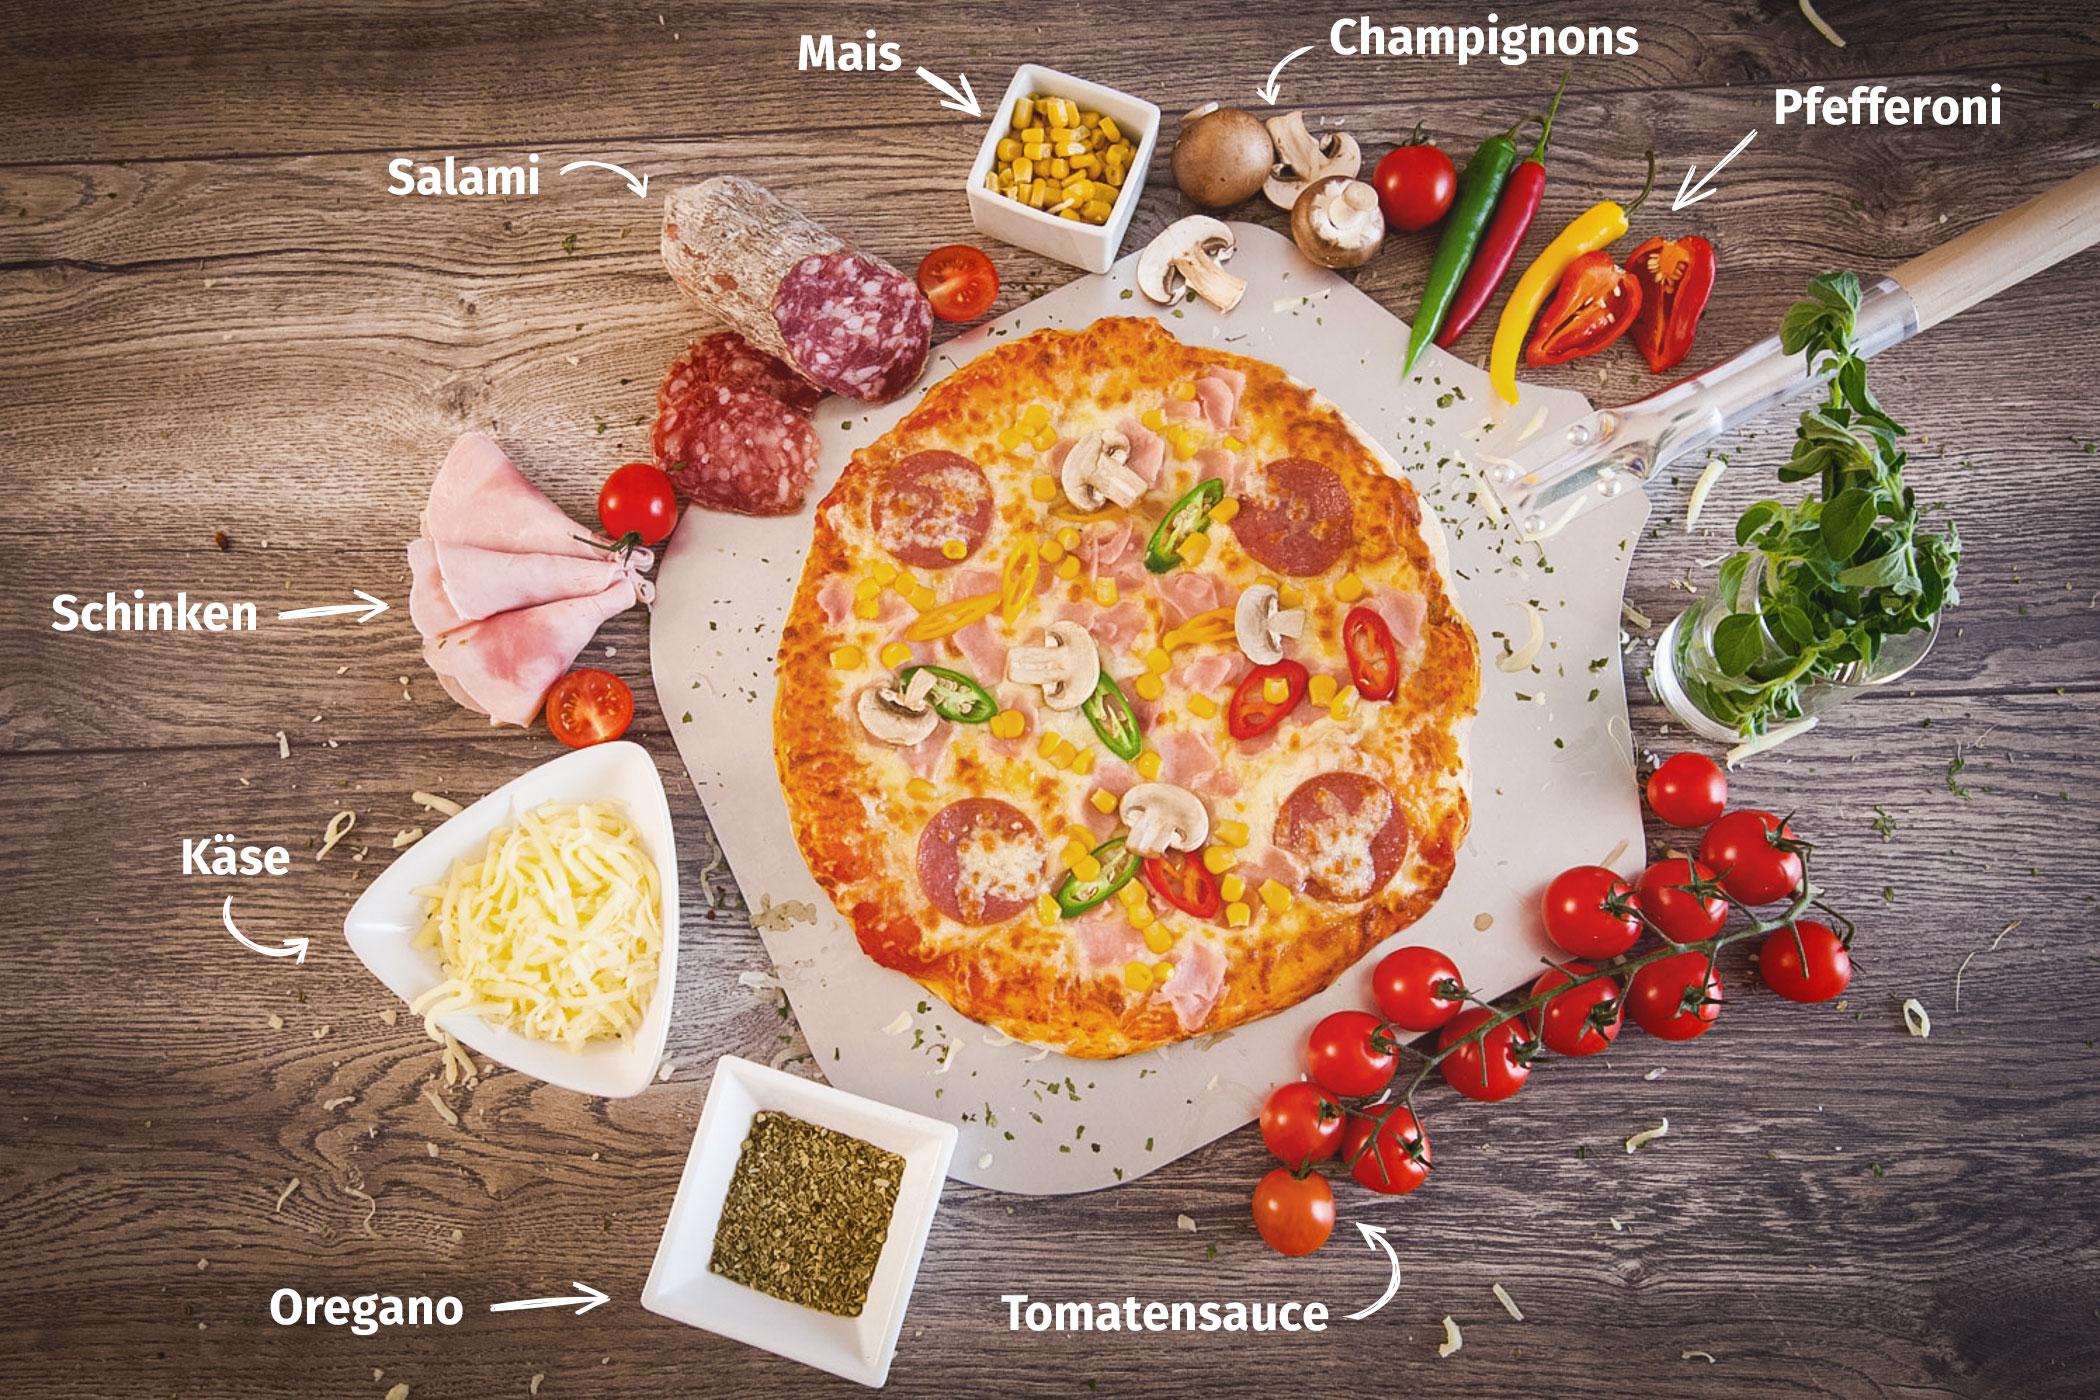 Original Franzesco Pizza Spezial belegt mit Tomatensauce, Schinken, Käse, Salami, Mais, Champigons und Oregano